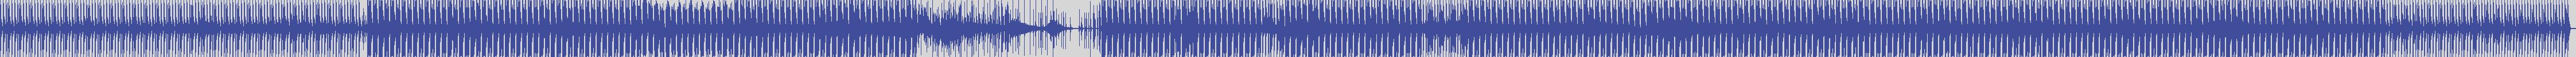 just_digital_records [JS1204] Maurizio Jave - Cloroformio [Original Mix] audio wave form